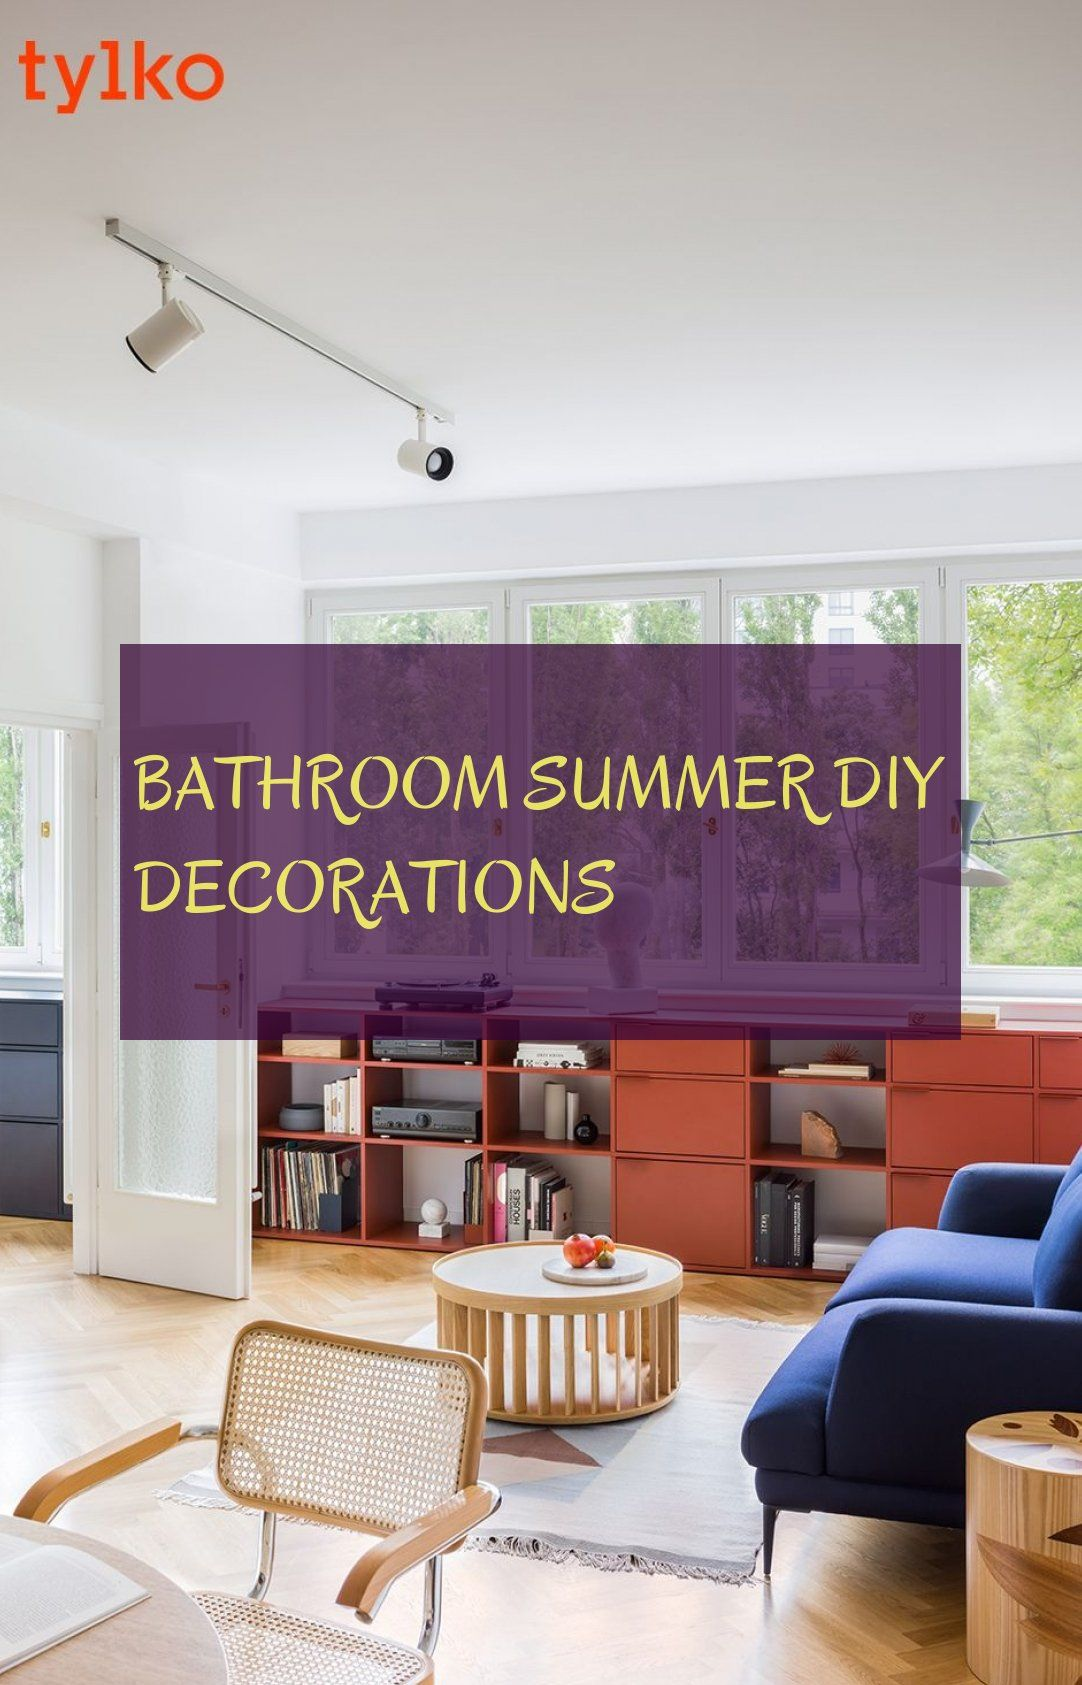 Bathroom summer diy decorations